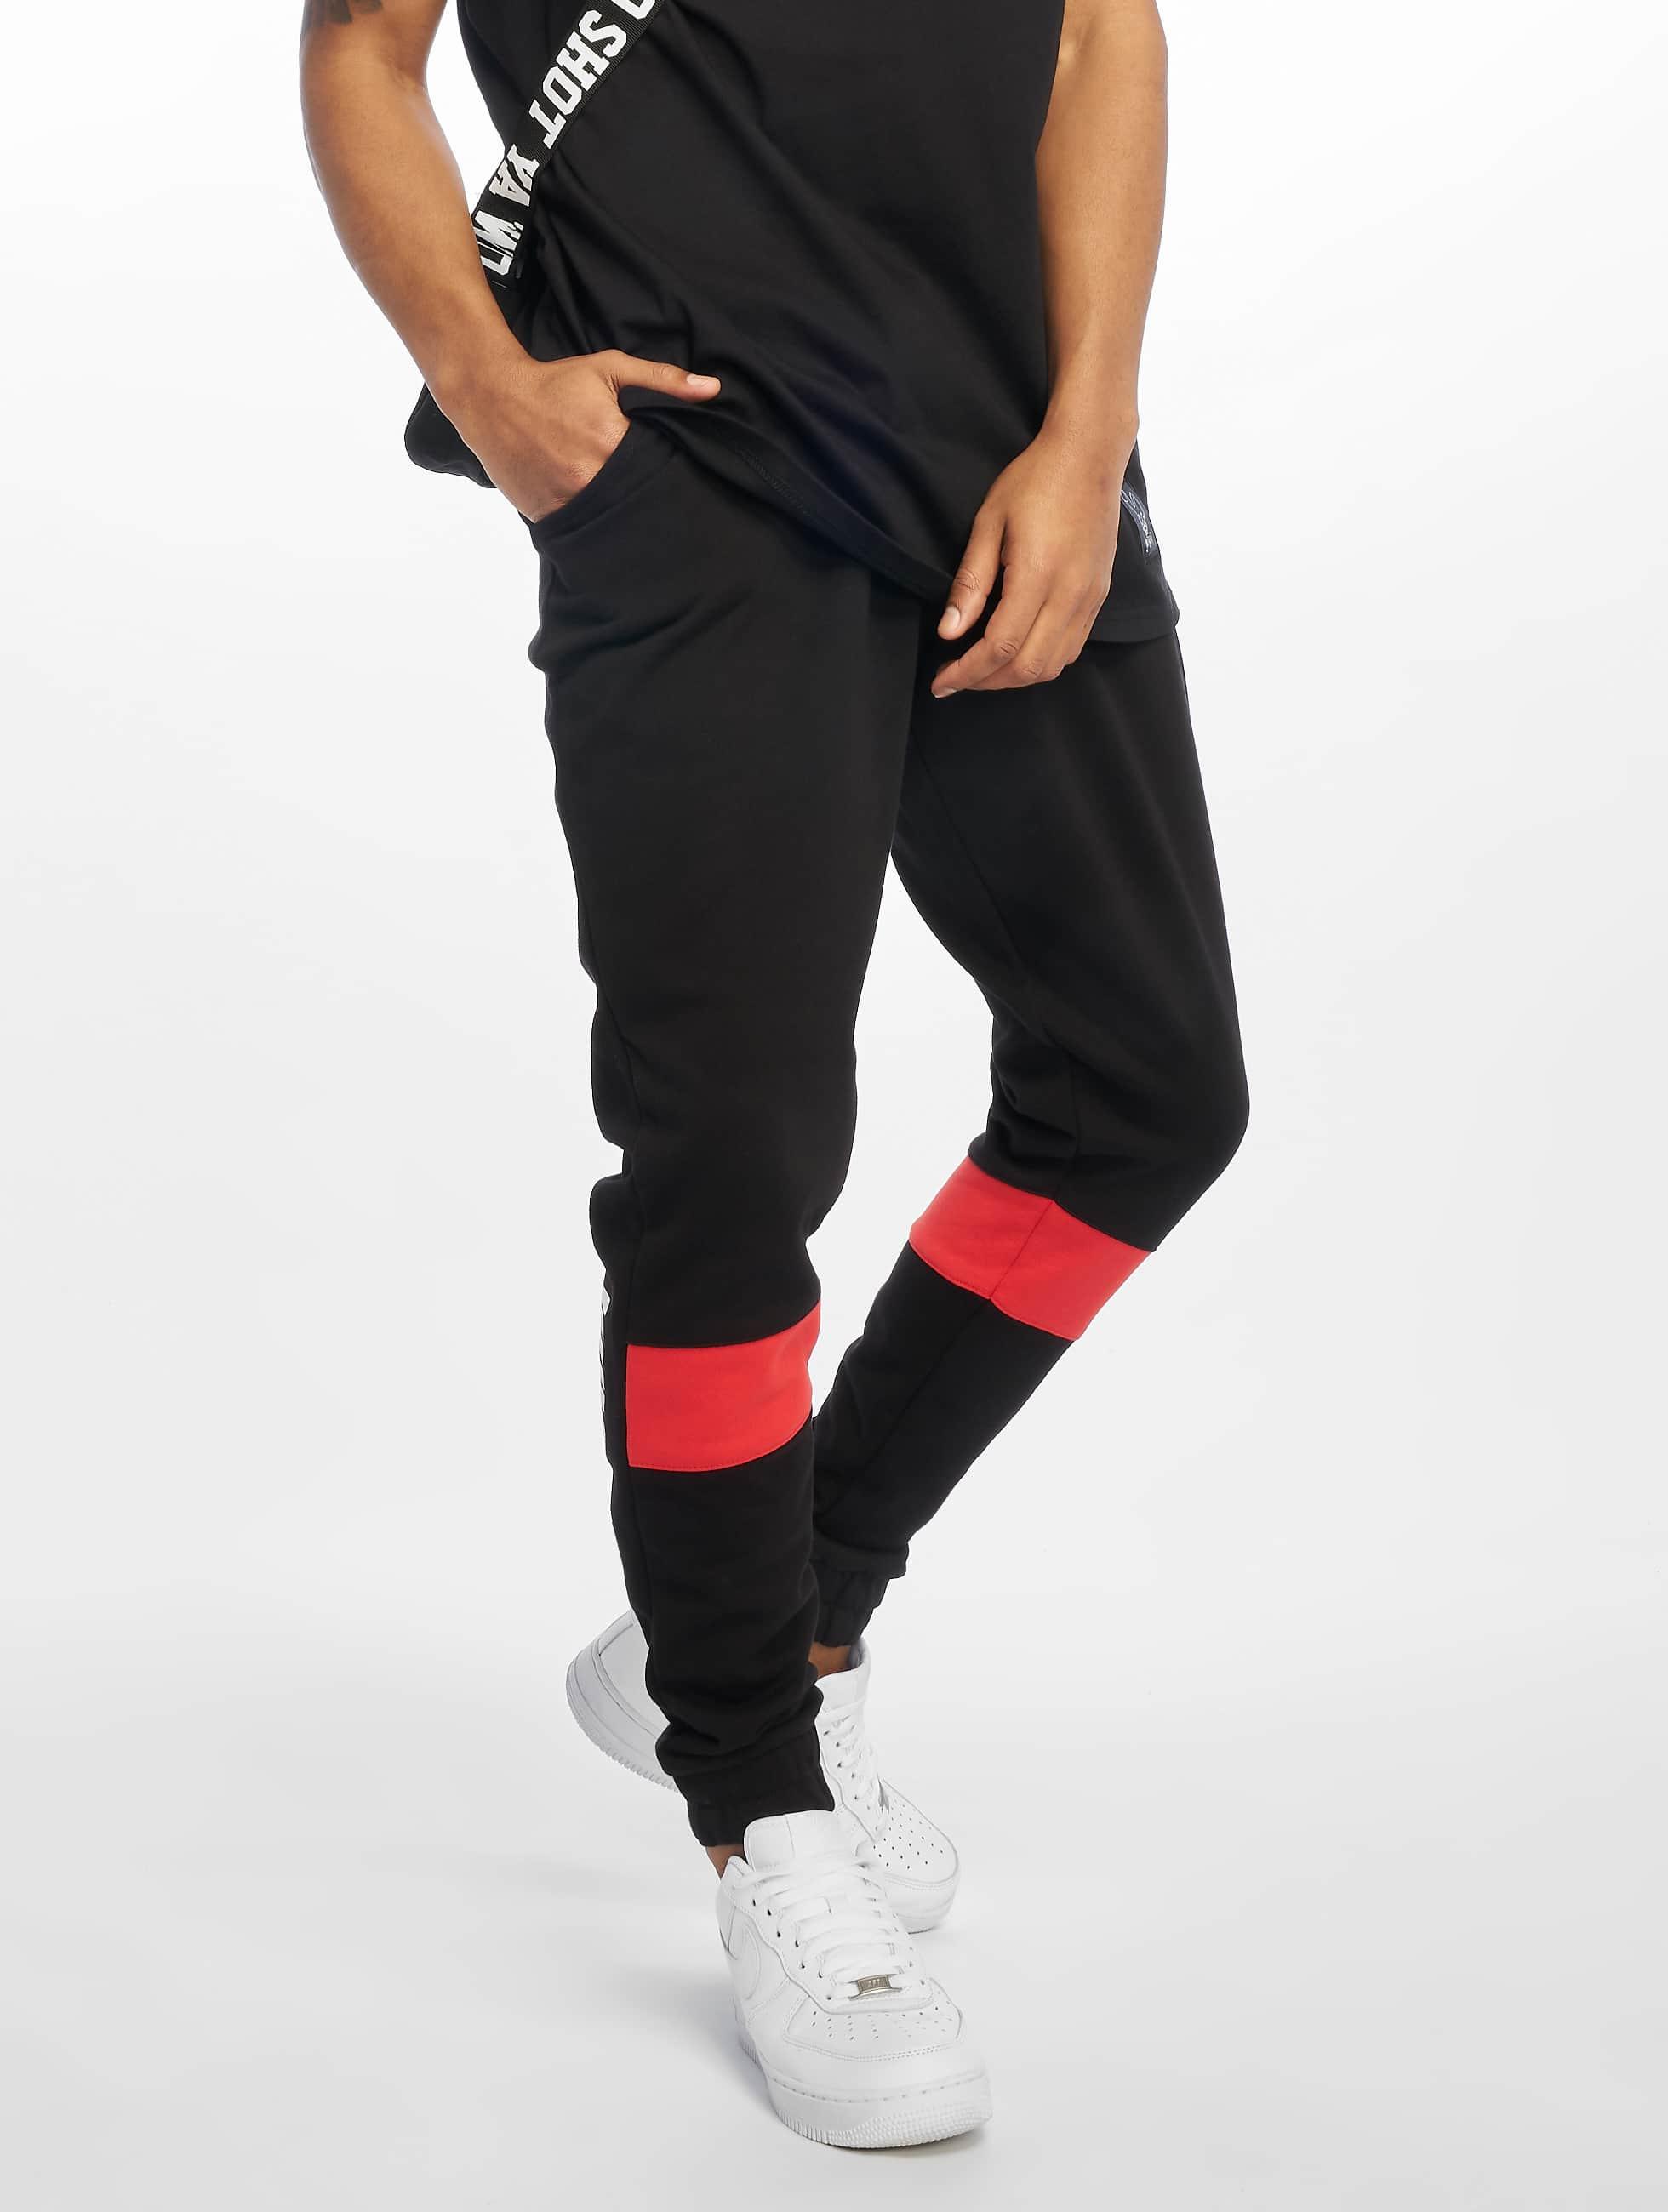 Who Shot Ya? / Sweat Pant Originals in black 3XL